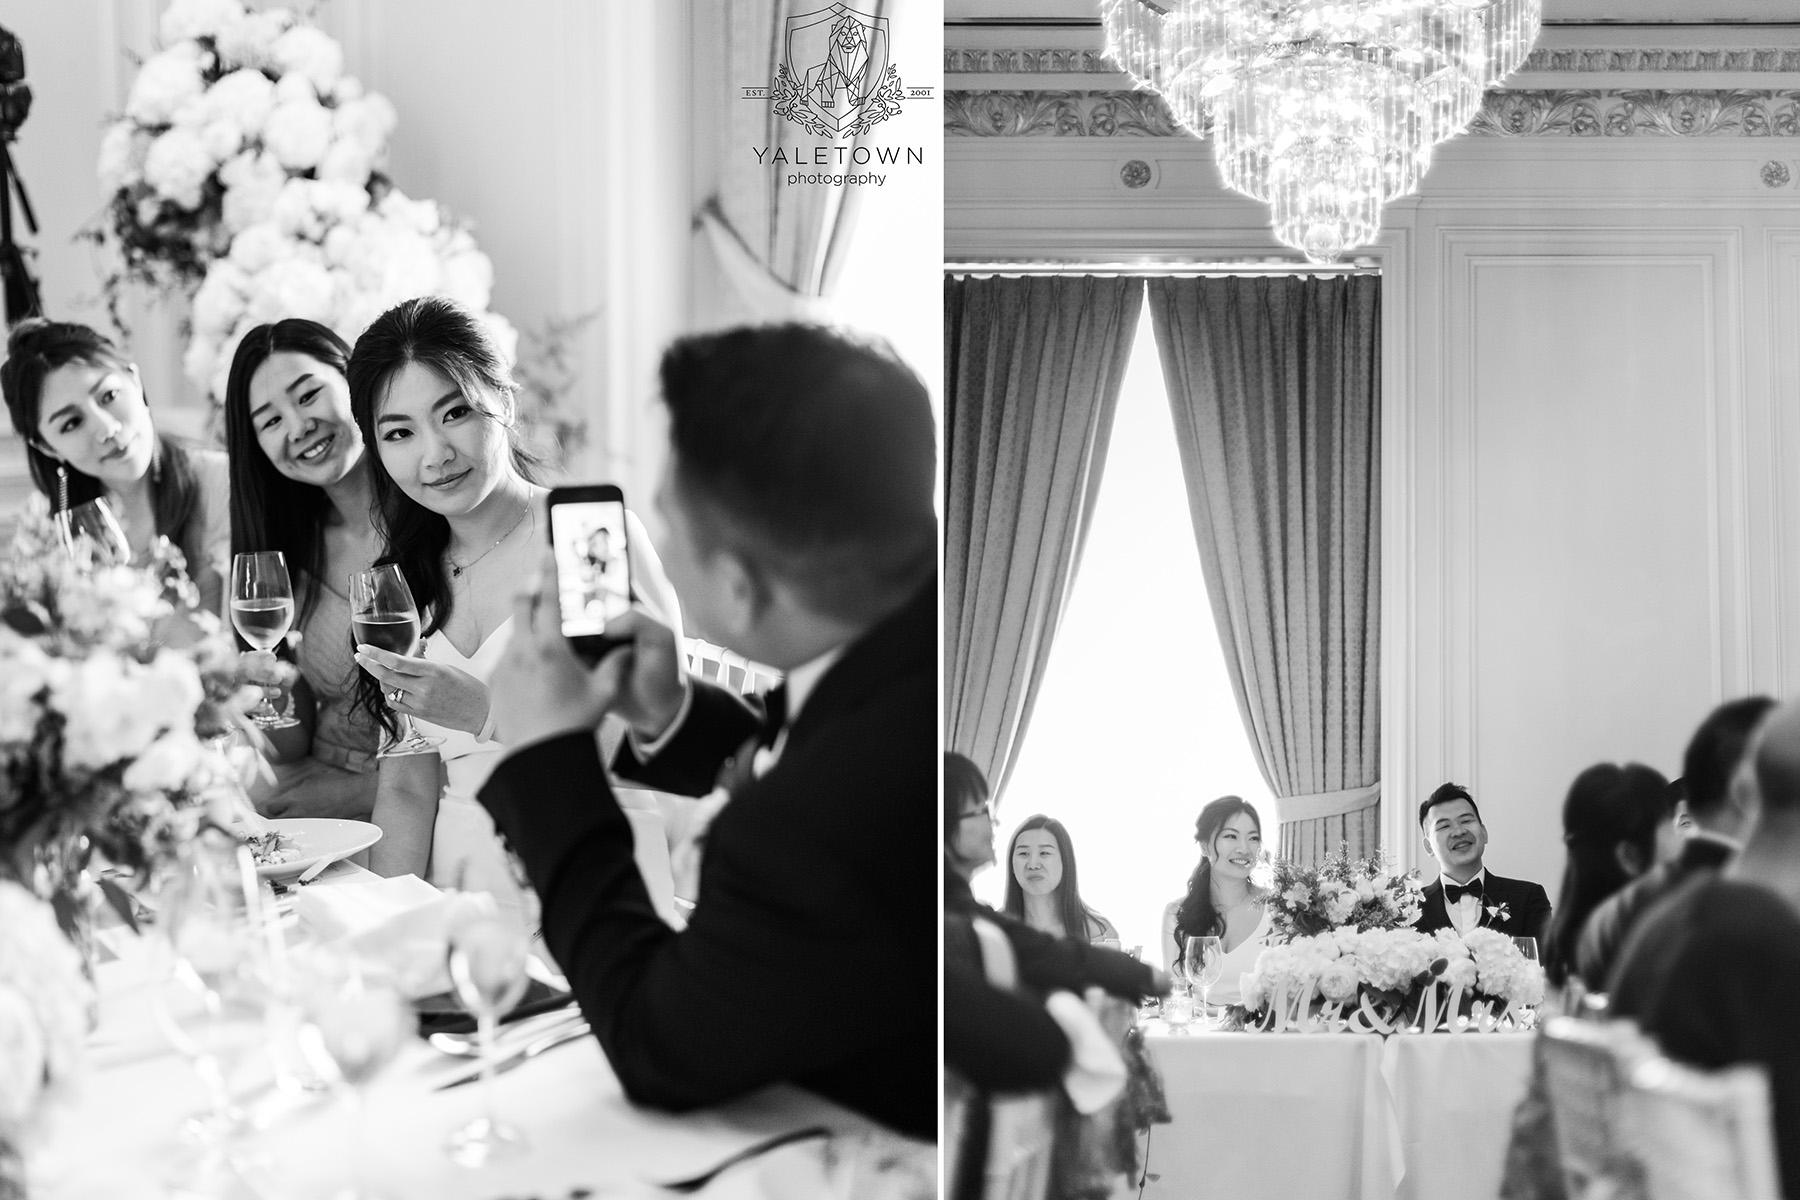 Wedding-Reception-Bride-Groom-Rosewood-Hotel-Georgia-Vancouver-Wedding-Yaletown-Photography-photo